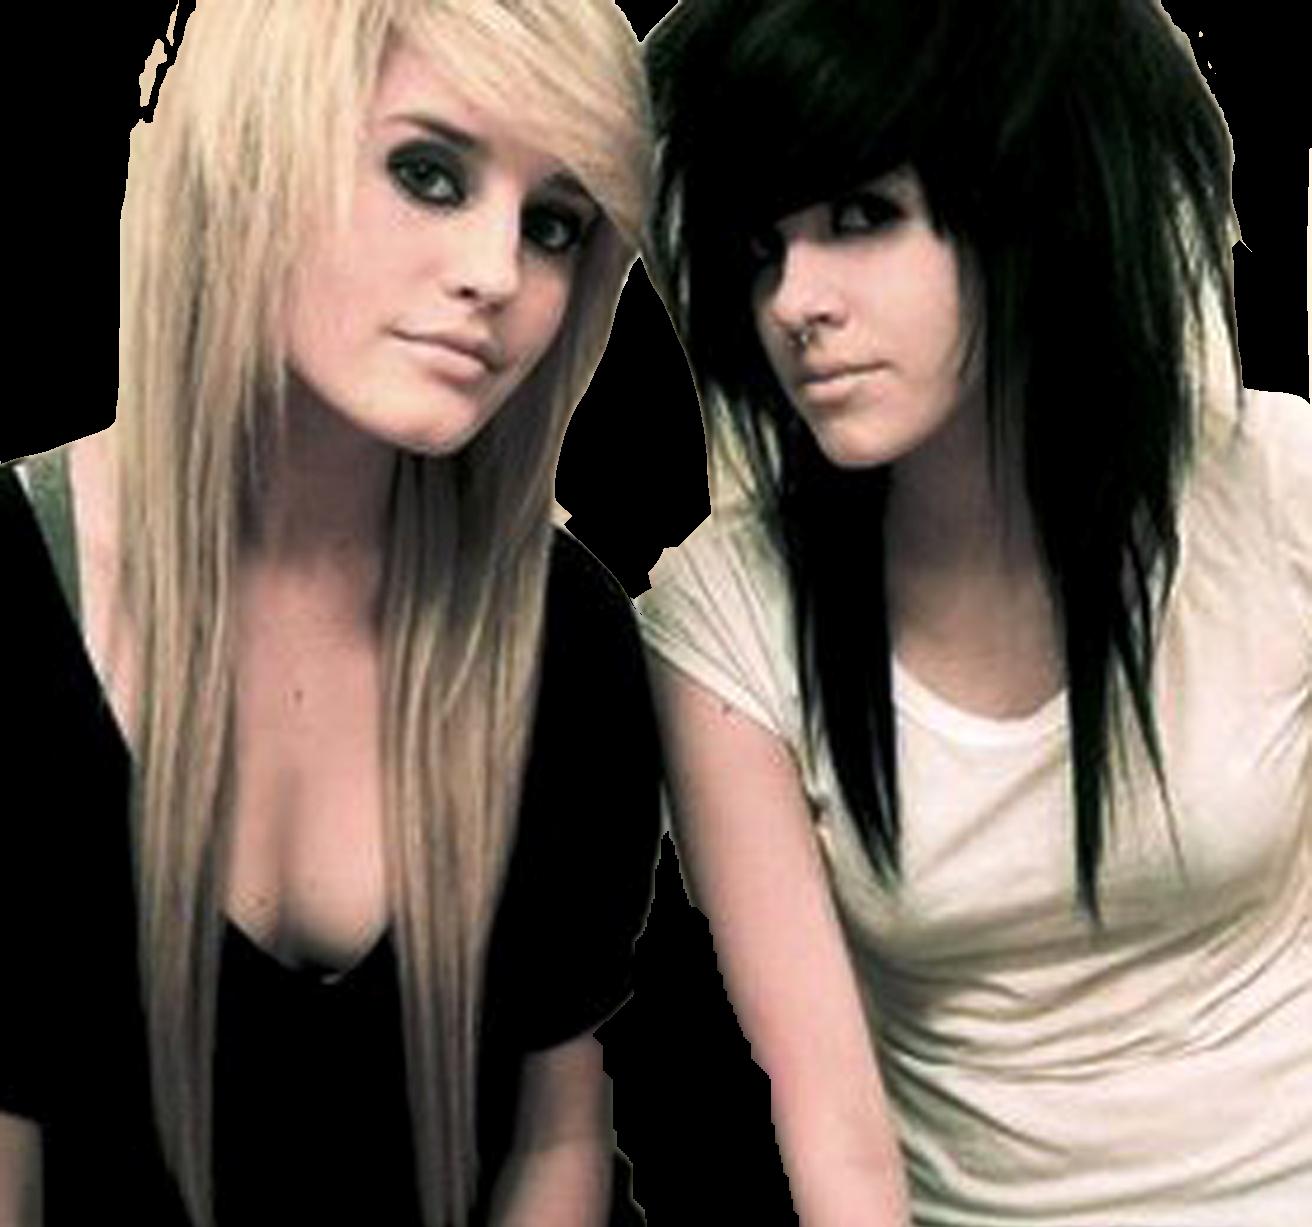 rockero cambios de look choppy hair corte de pelo emo emo punk haircut